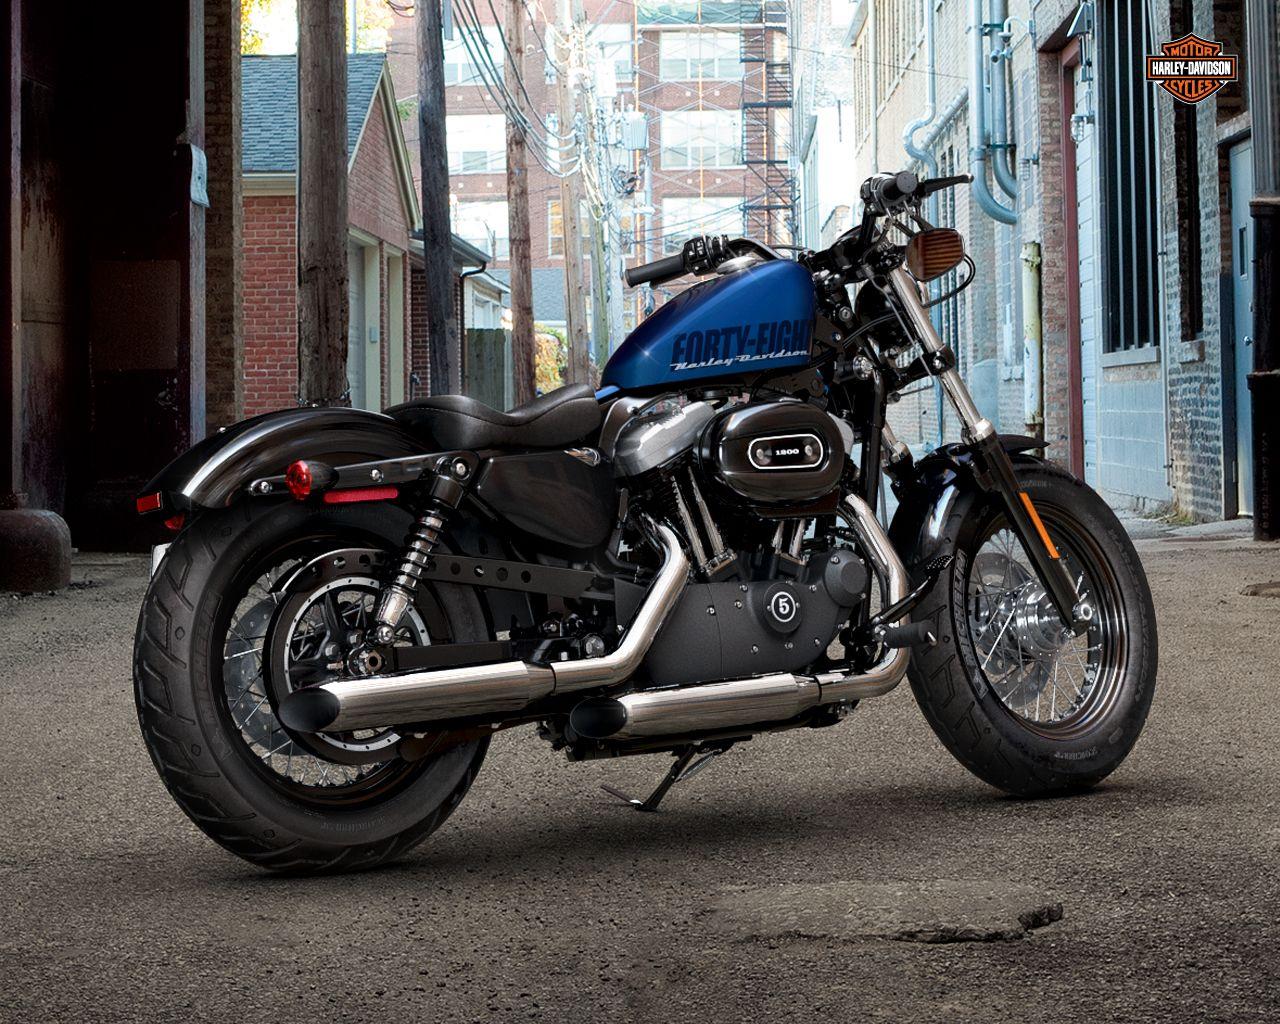 Harley Davidson Sportster 48 Wallpaper Motocicletas Motos